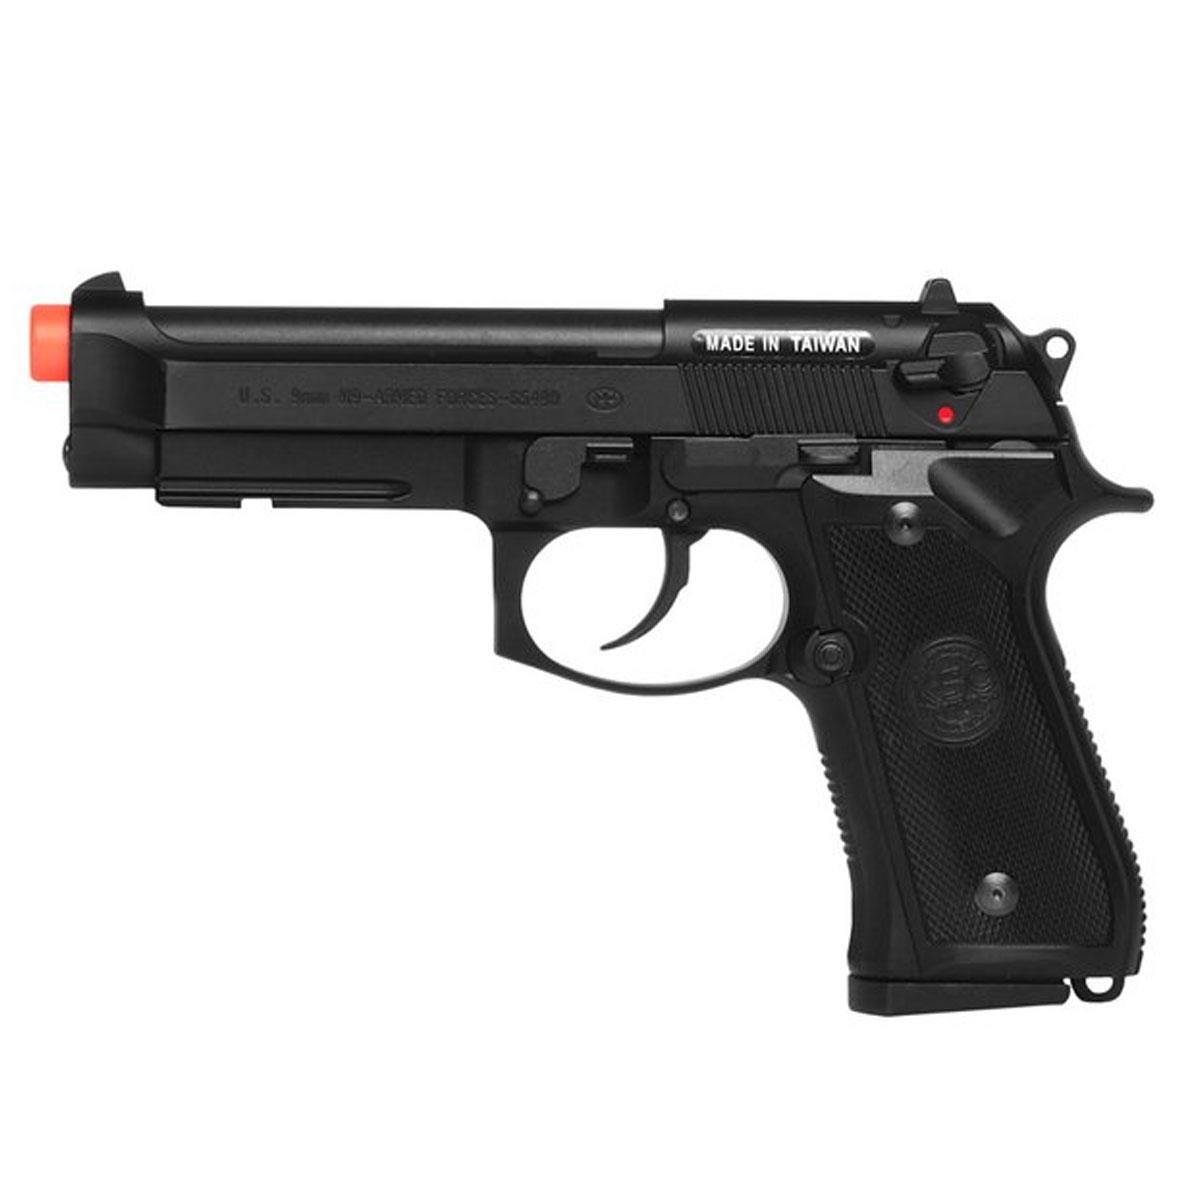 Pistola de Airsoft M9A1 KSC a gás GBB Blowback Green Gás